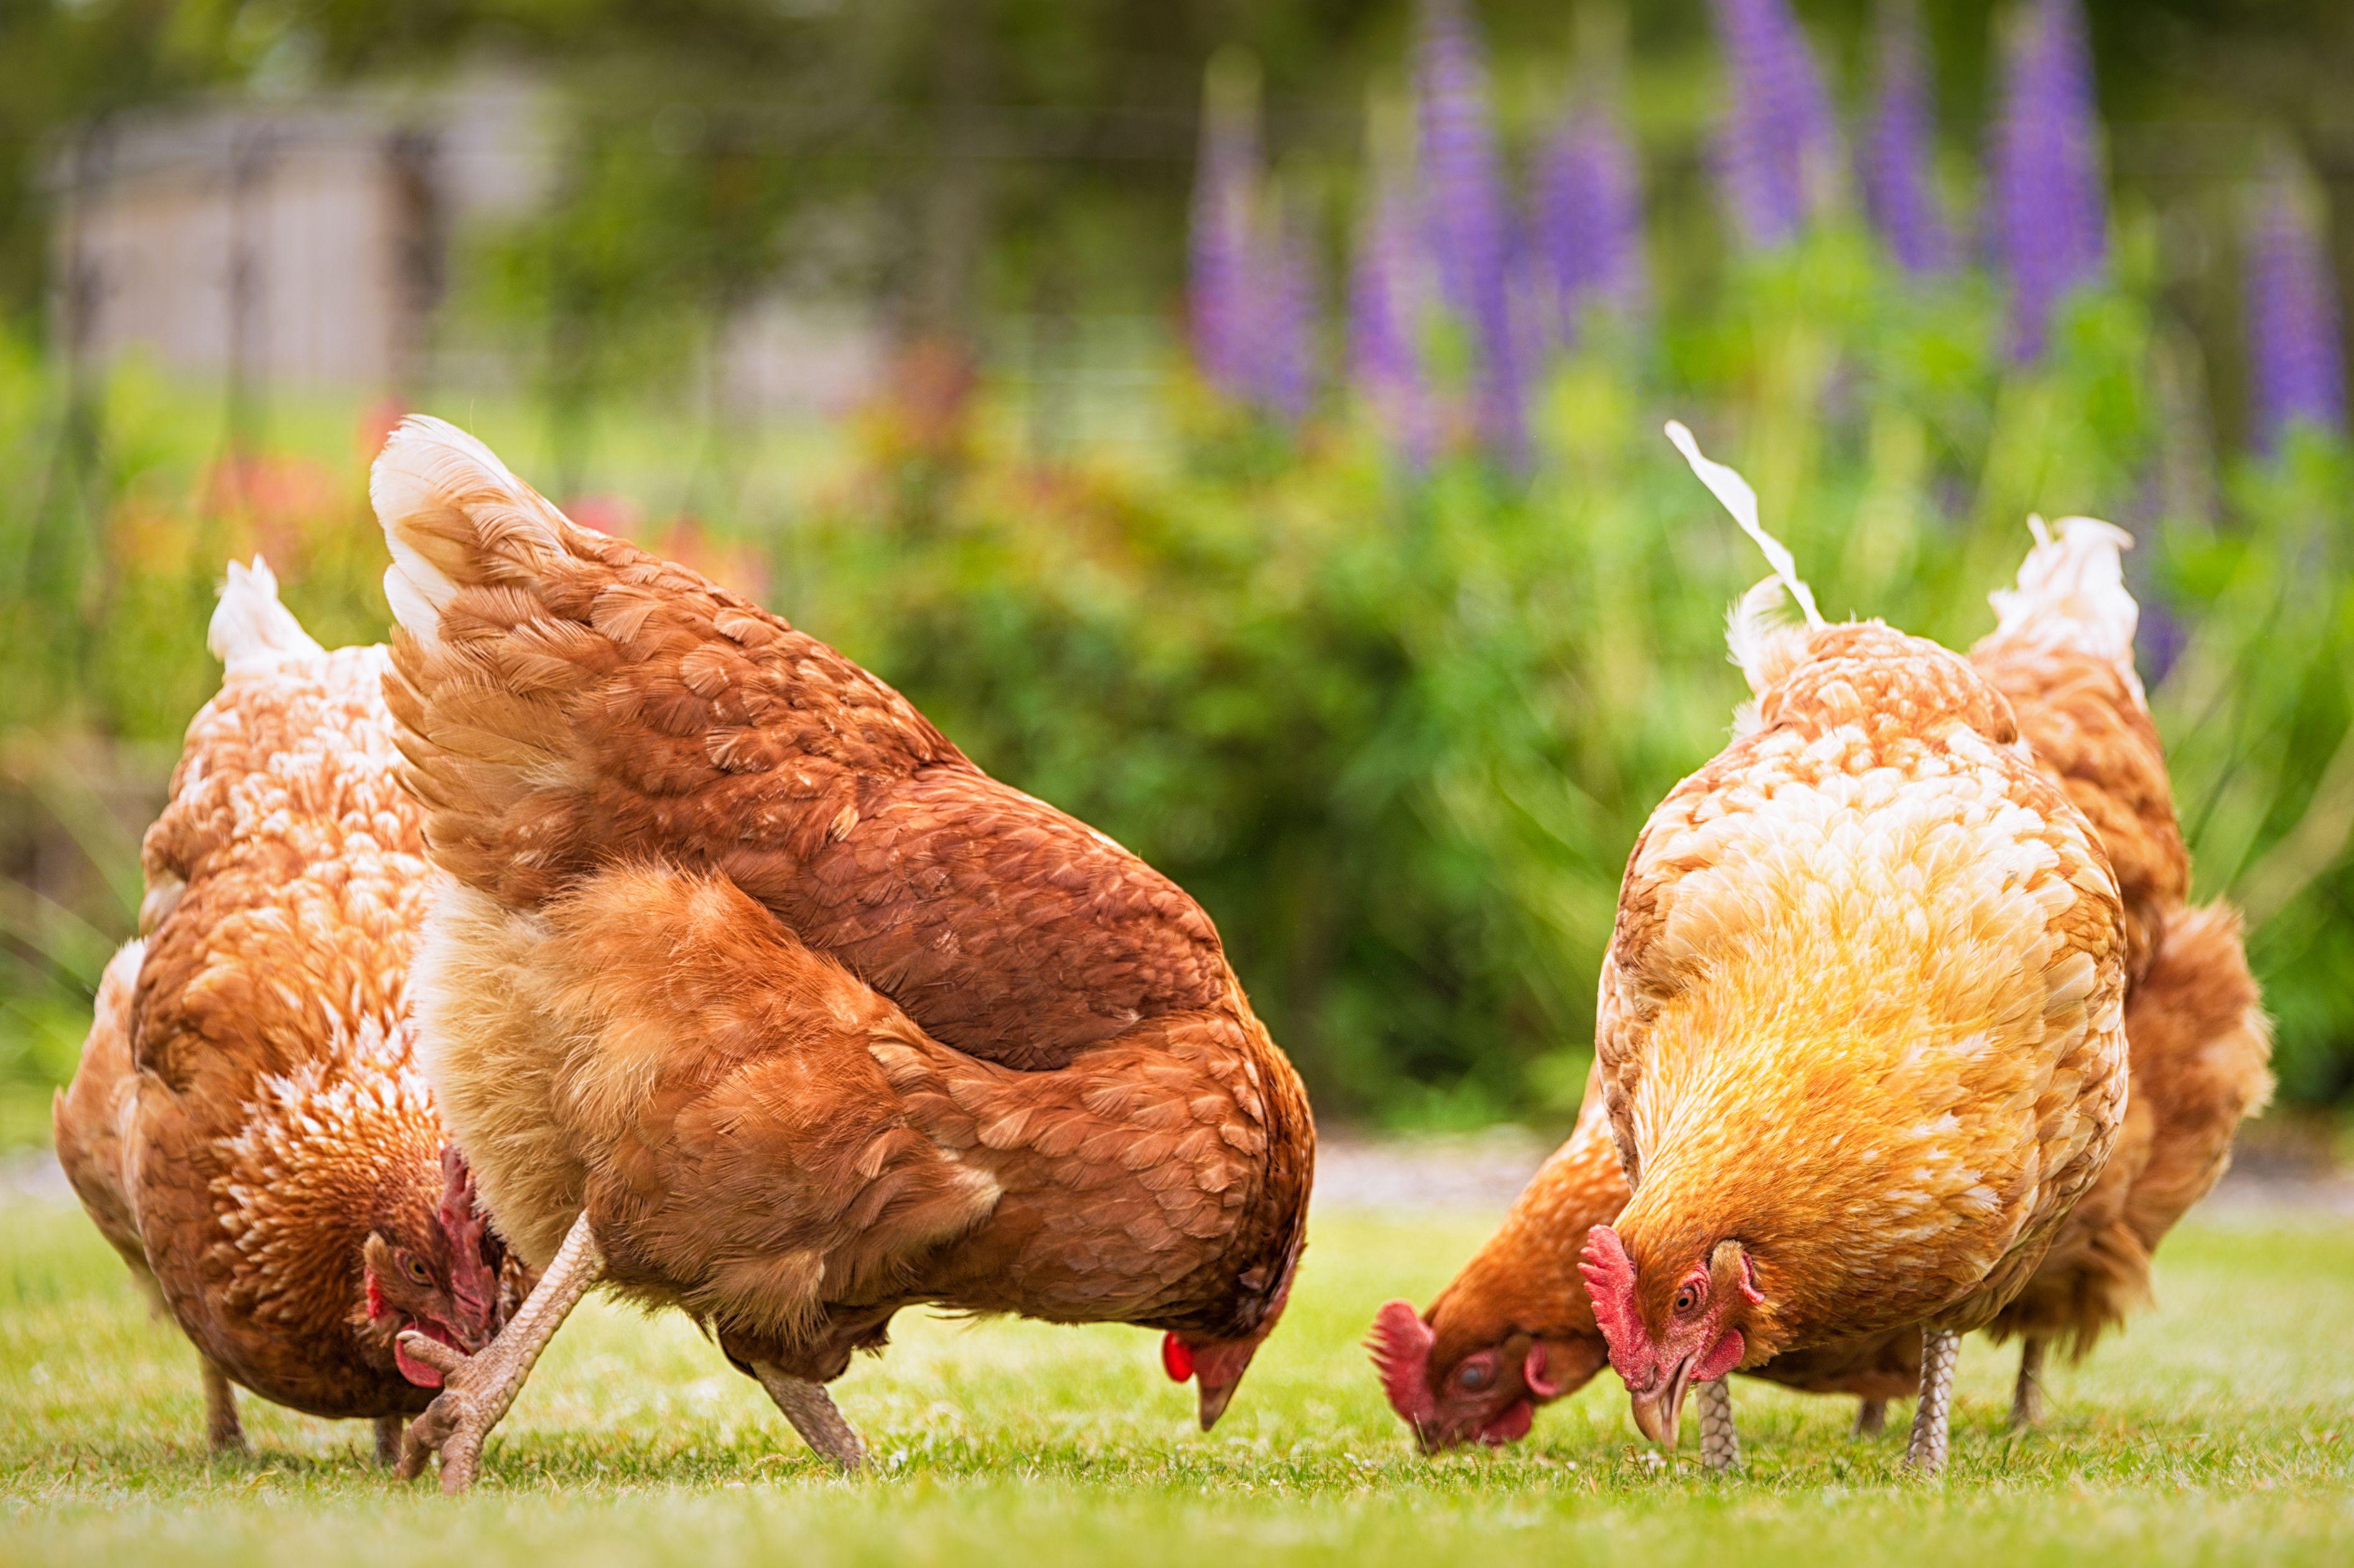 Backyard Chicken.com how to raise backyard chickens - backyard chickens 101